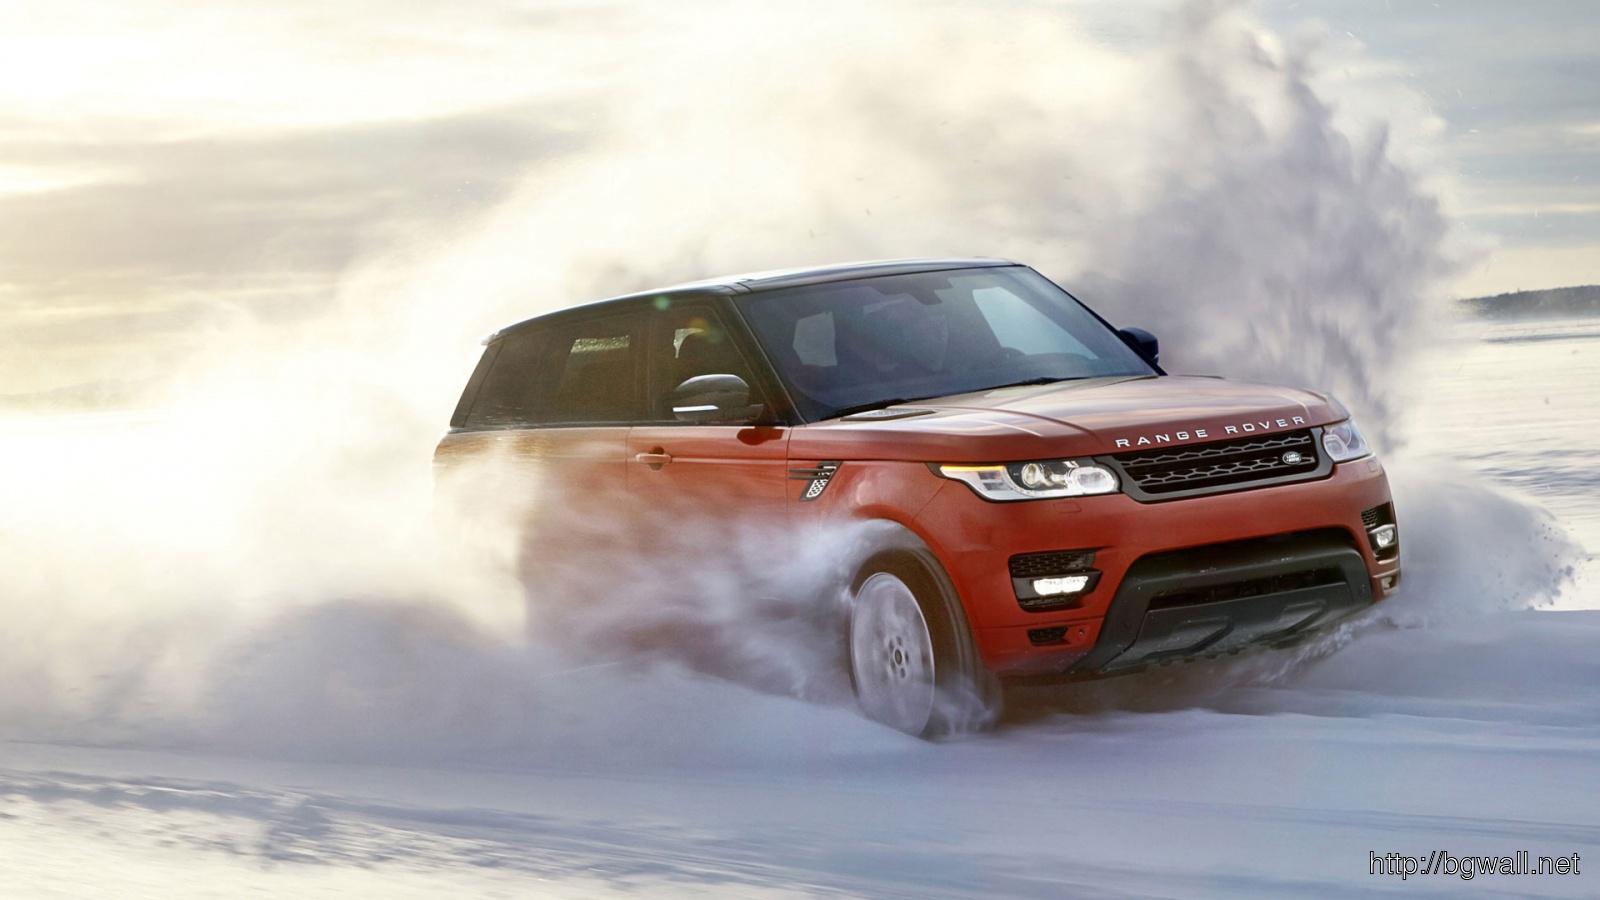 2014 Land Rover Range Rover Sport Wallpaper In 1600x900 Resolution Full Size